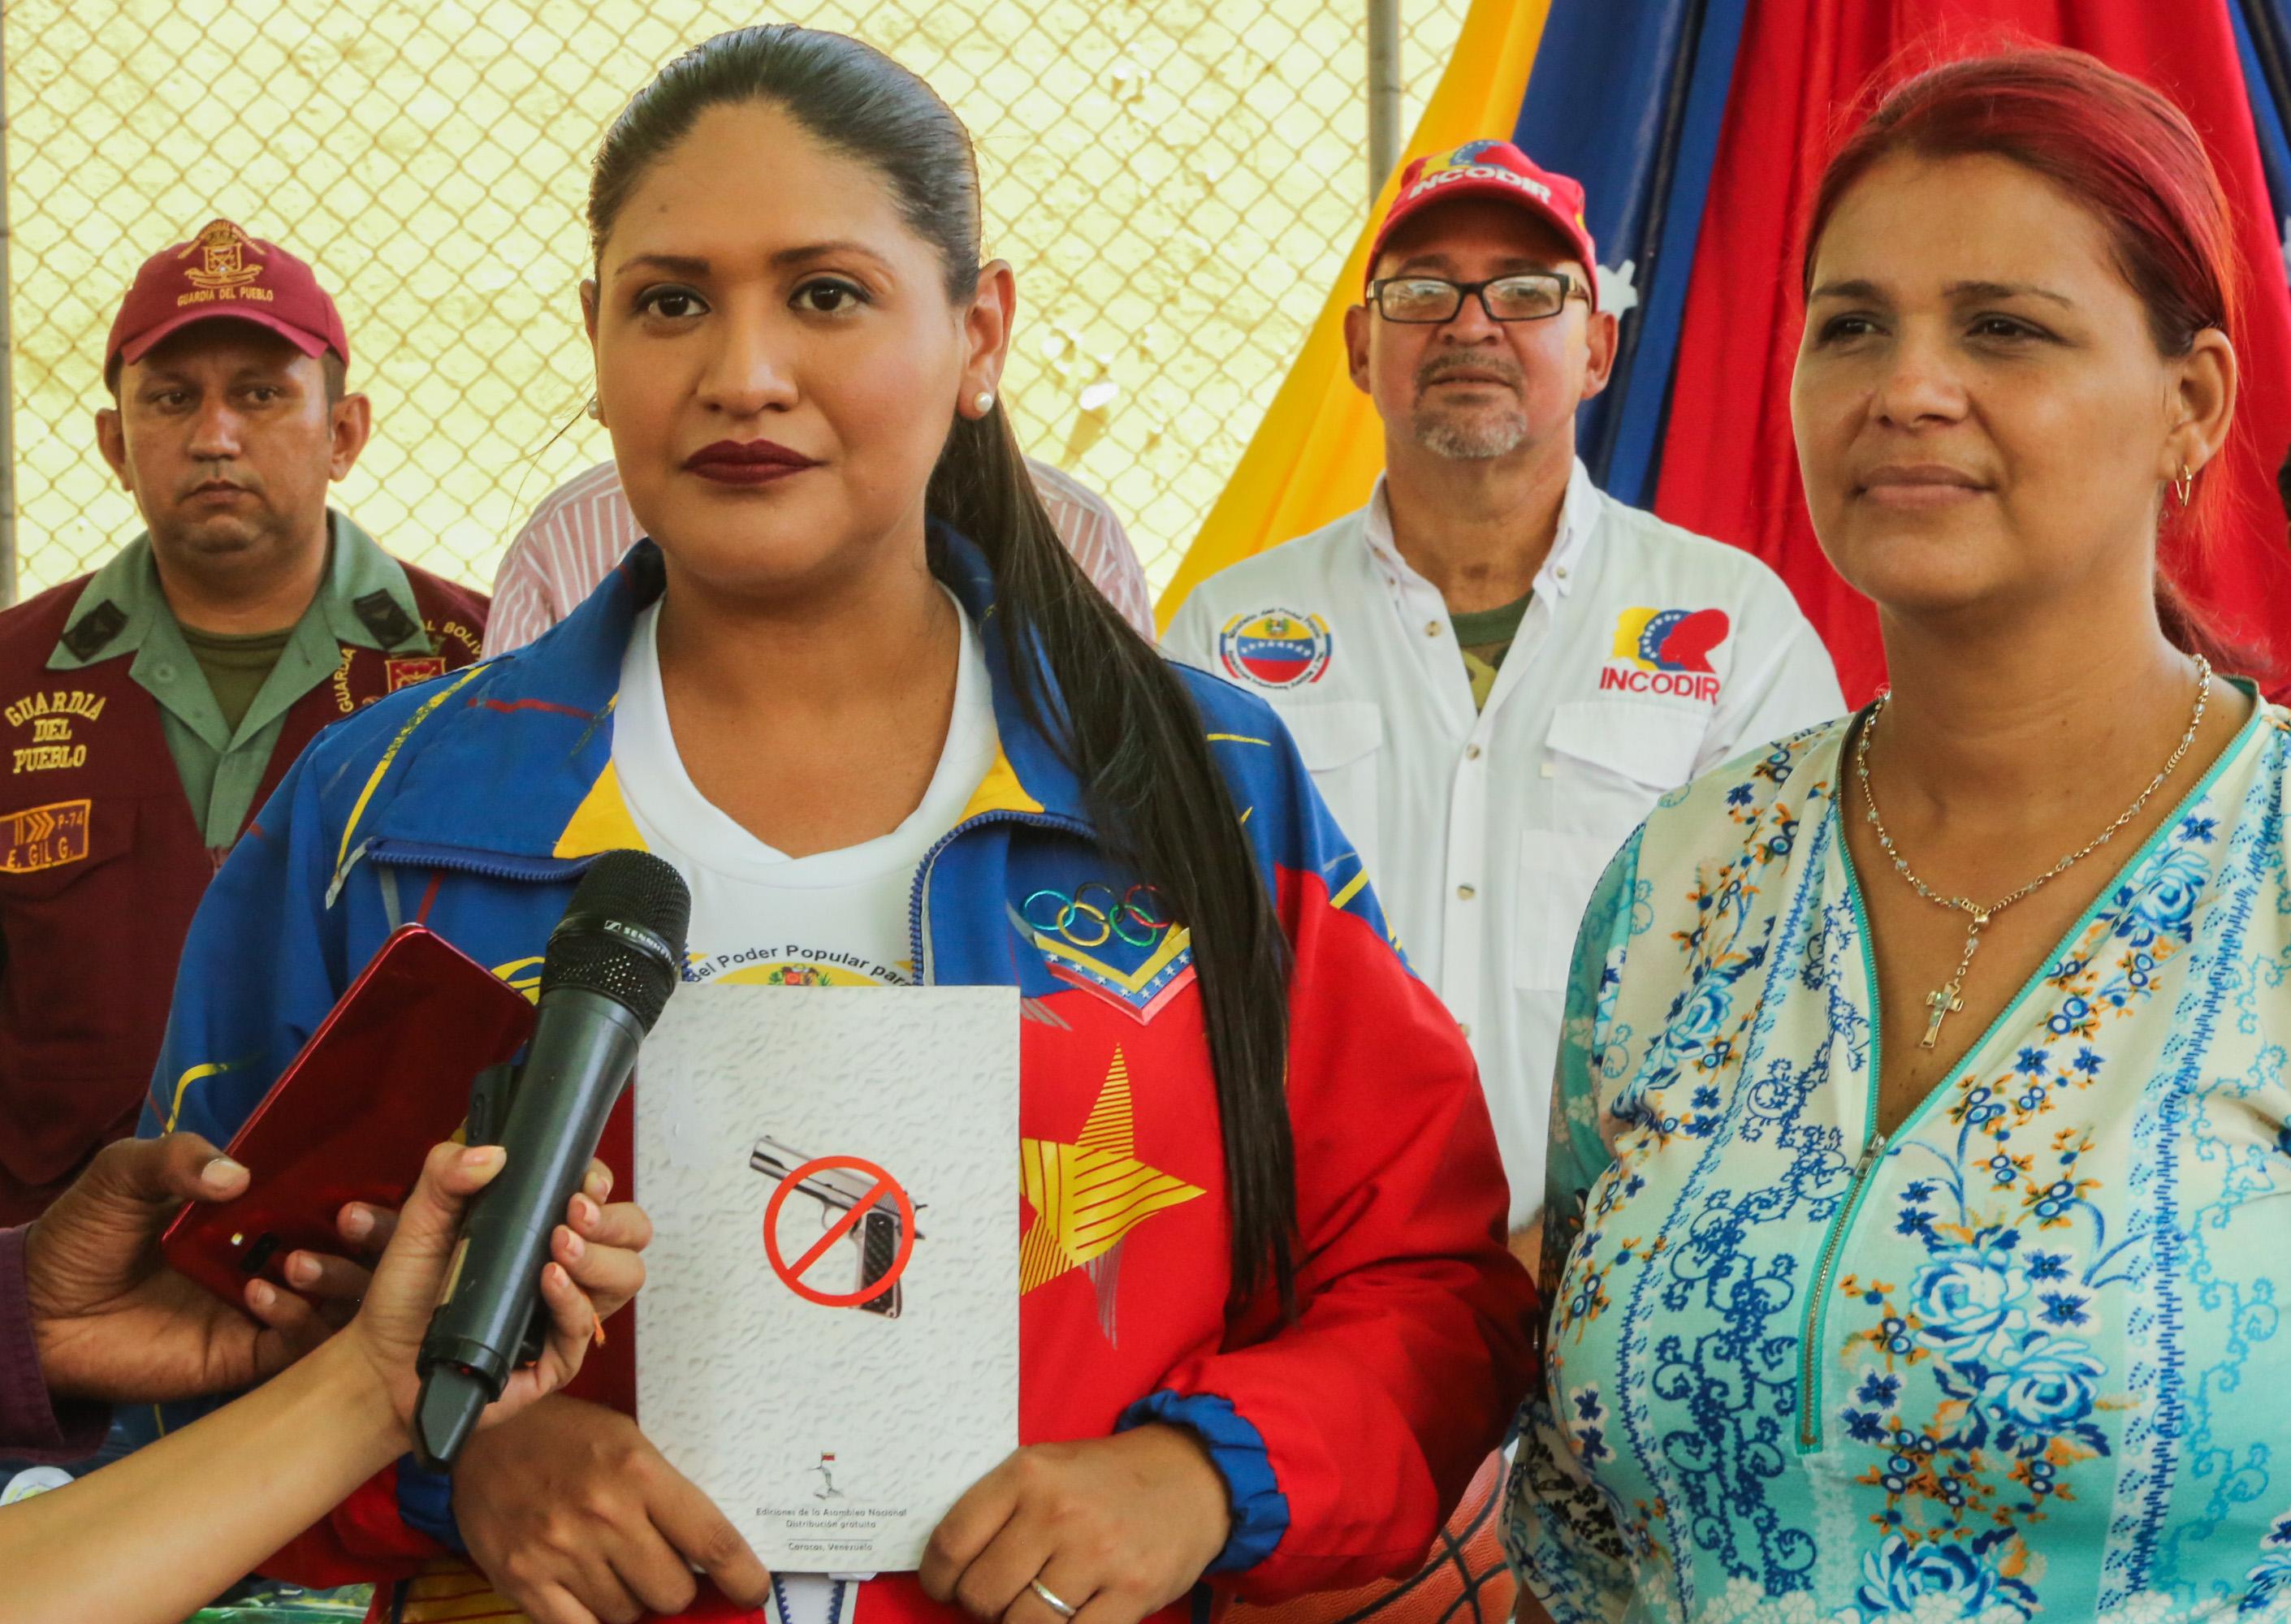 Frente Preventivo entregó útiles escolares a más de mil estudiantes guaireños (5)